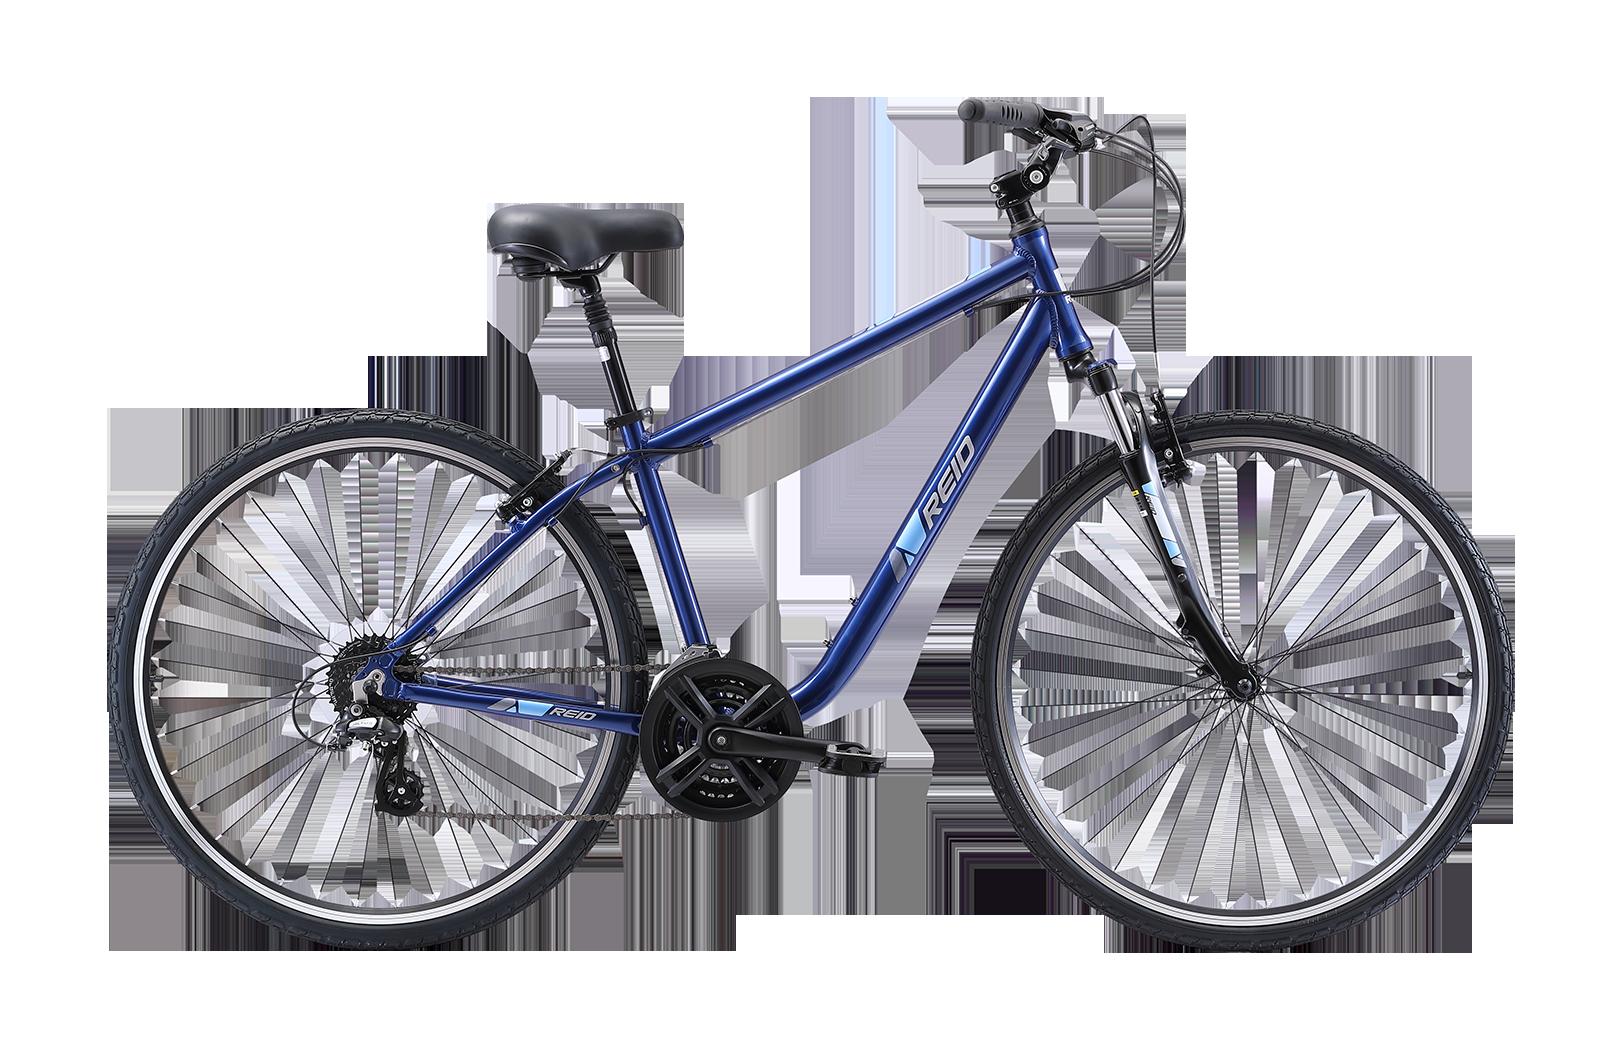 IMG 0013 - Reid ® - Comfort 3 Bike